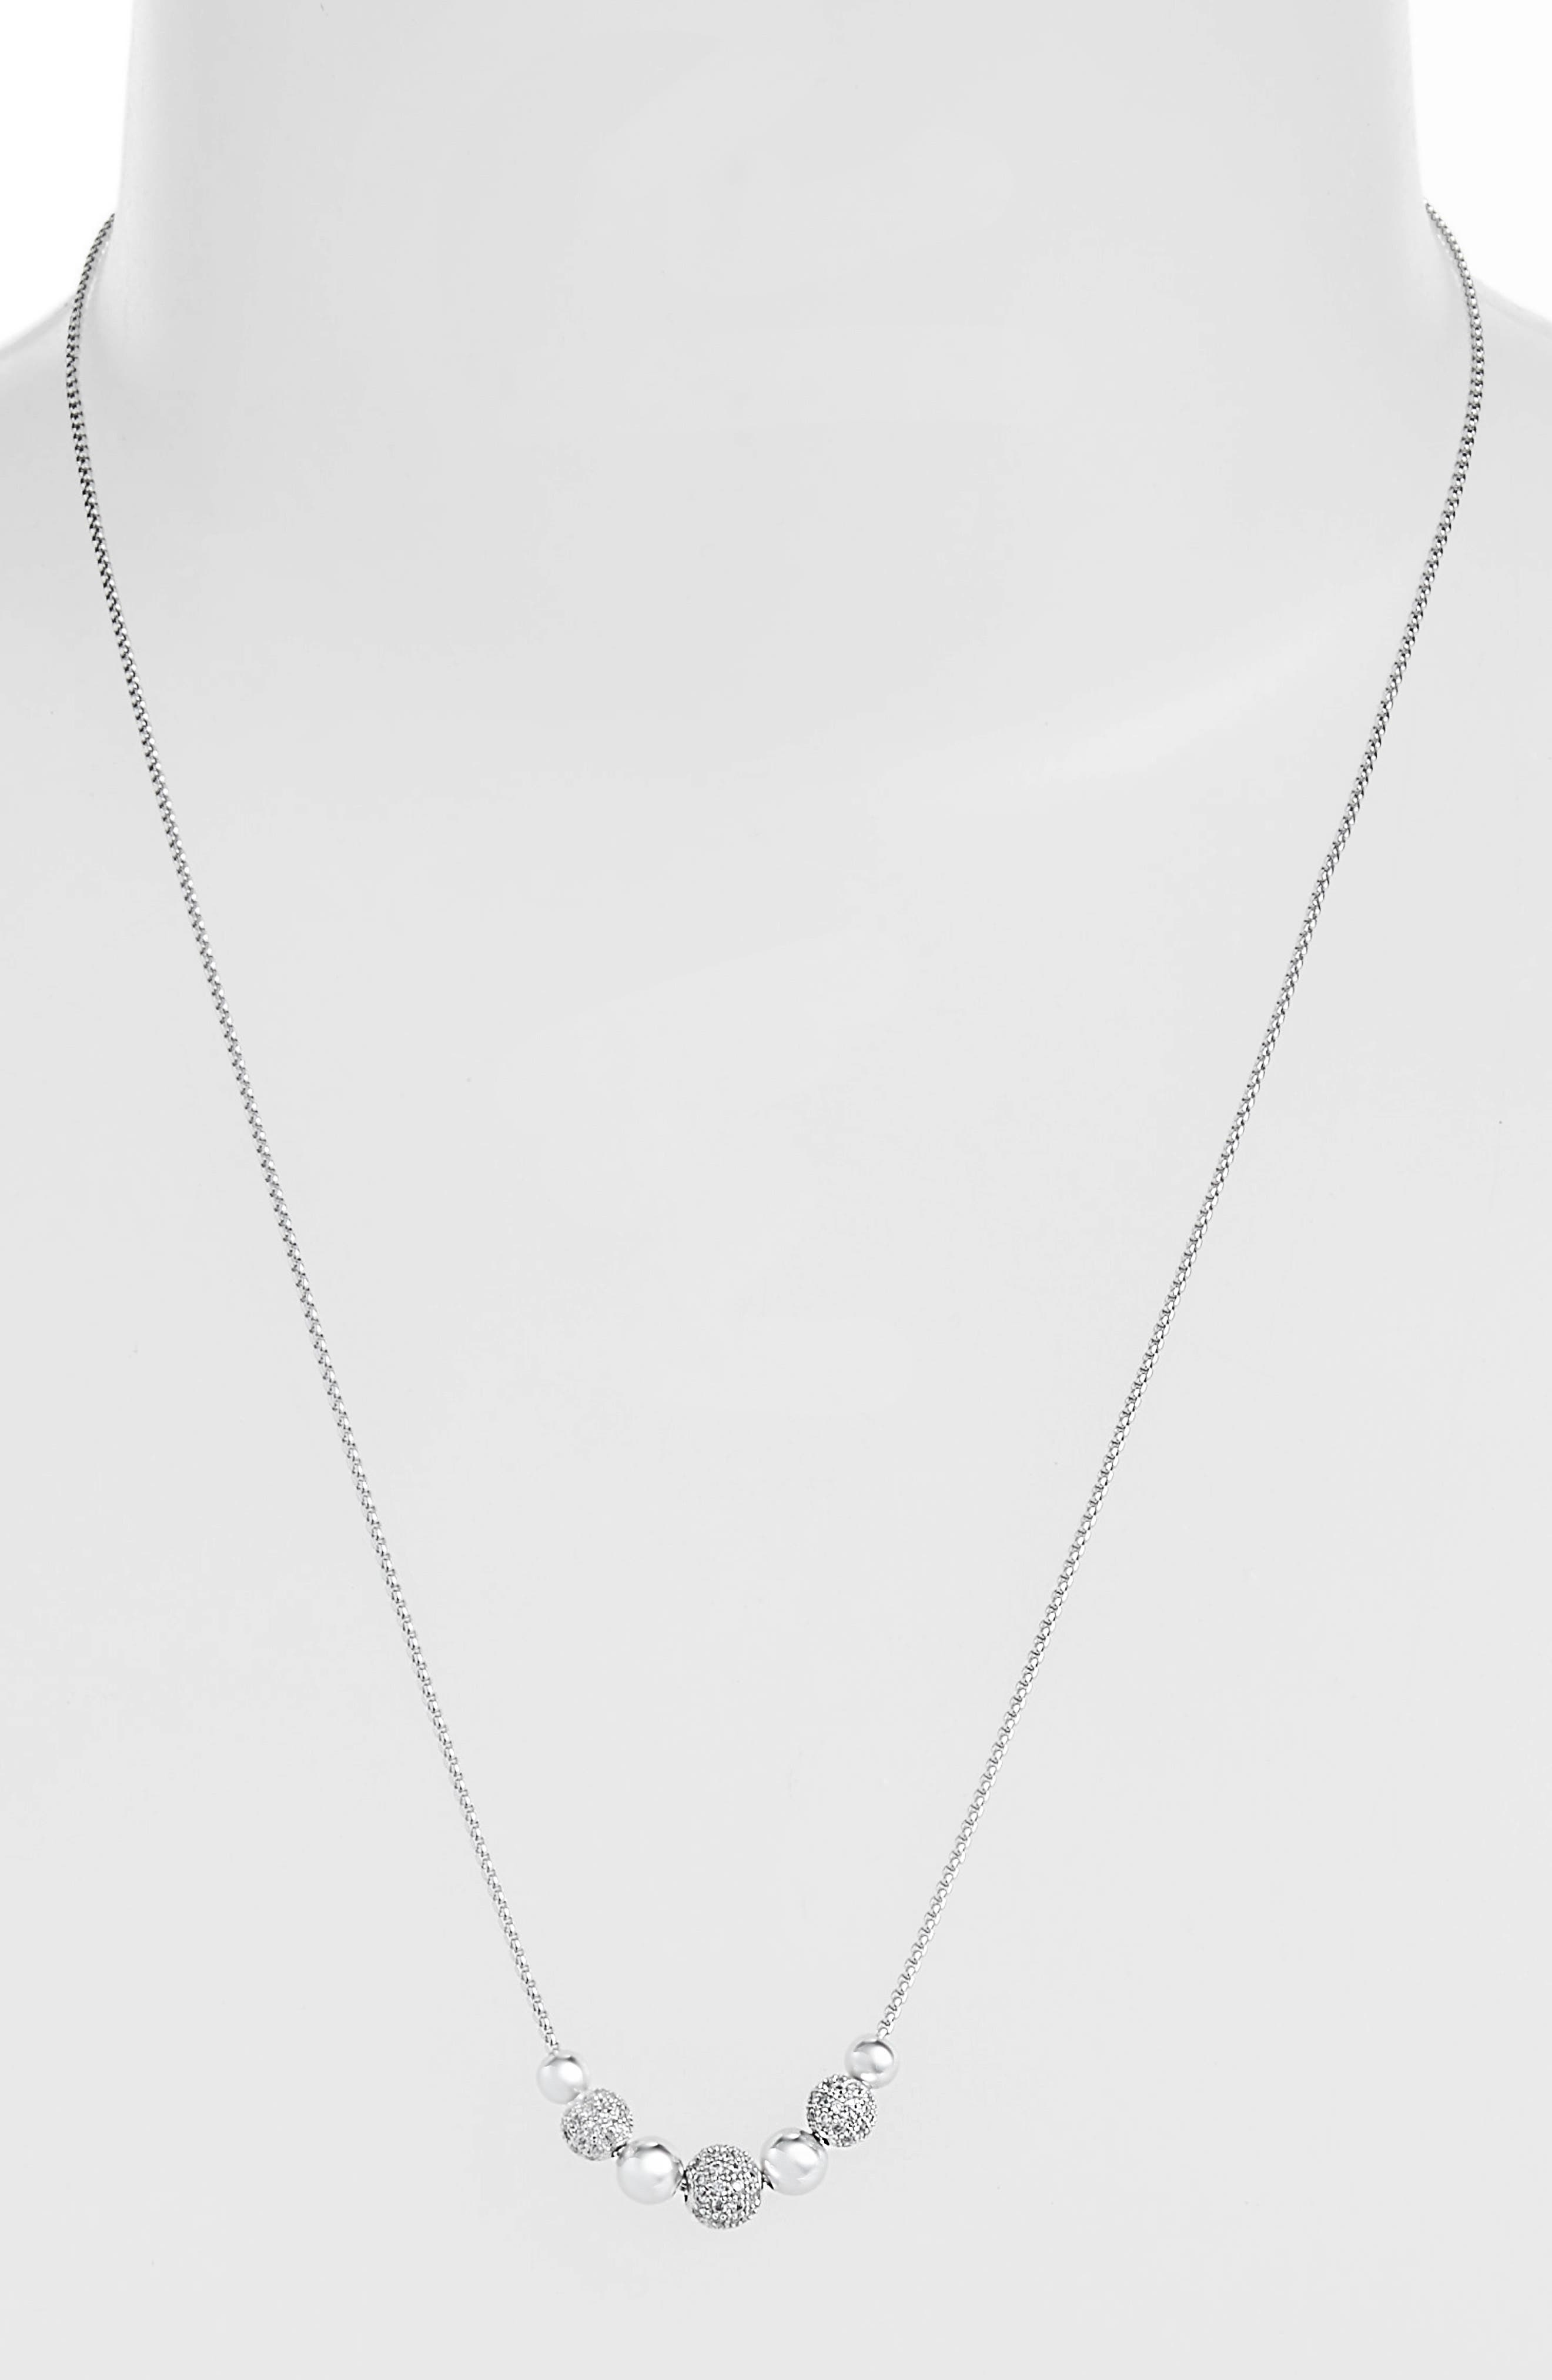 Metal Pavé Ball Adjustable Slide Necklace,                             Alternate thumbnail 2, color,                             CLEAR/ SILVER